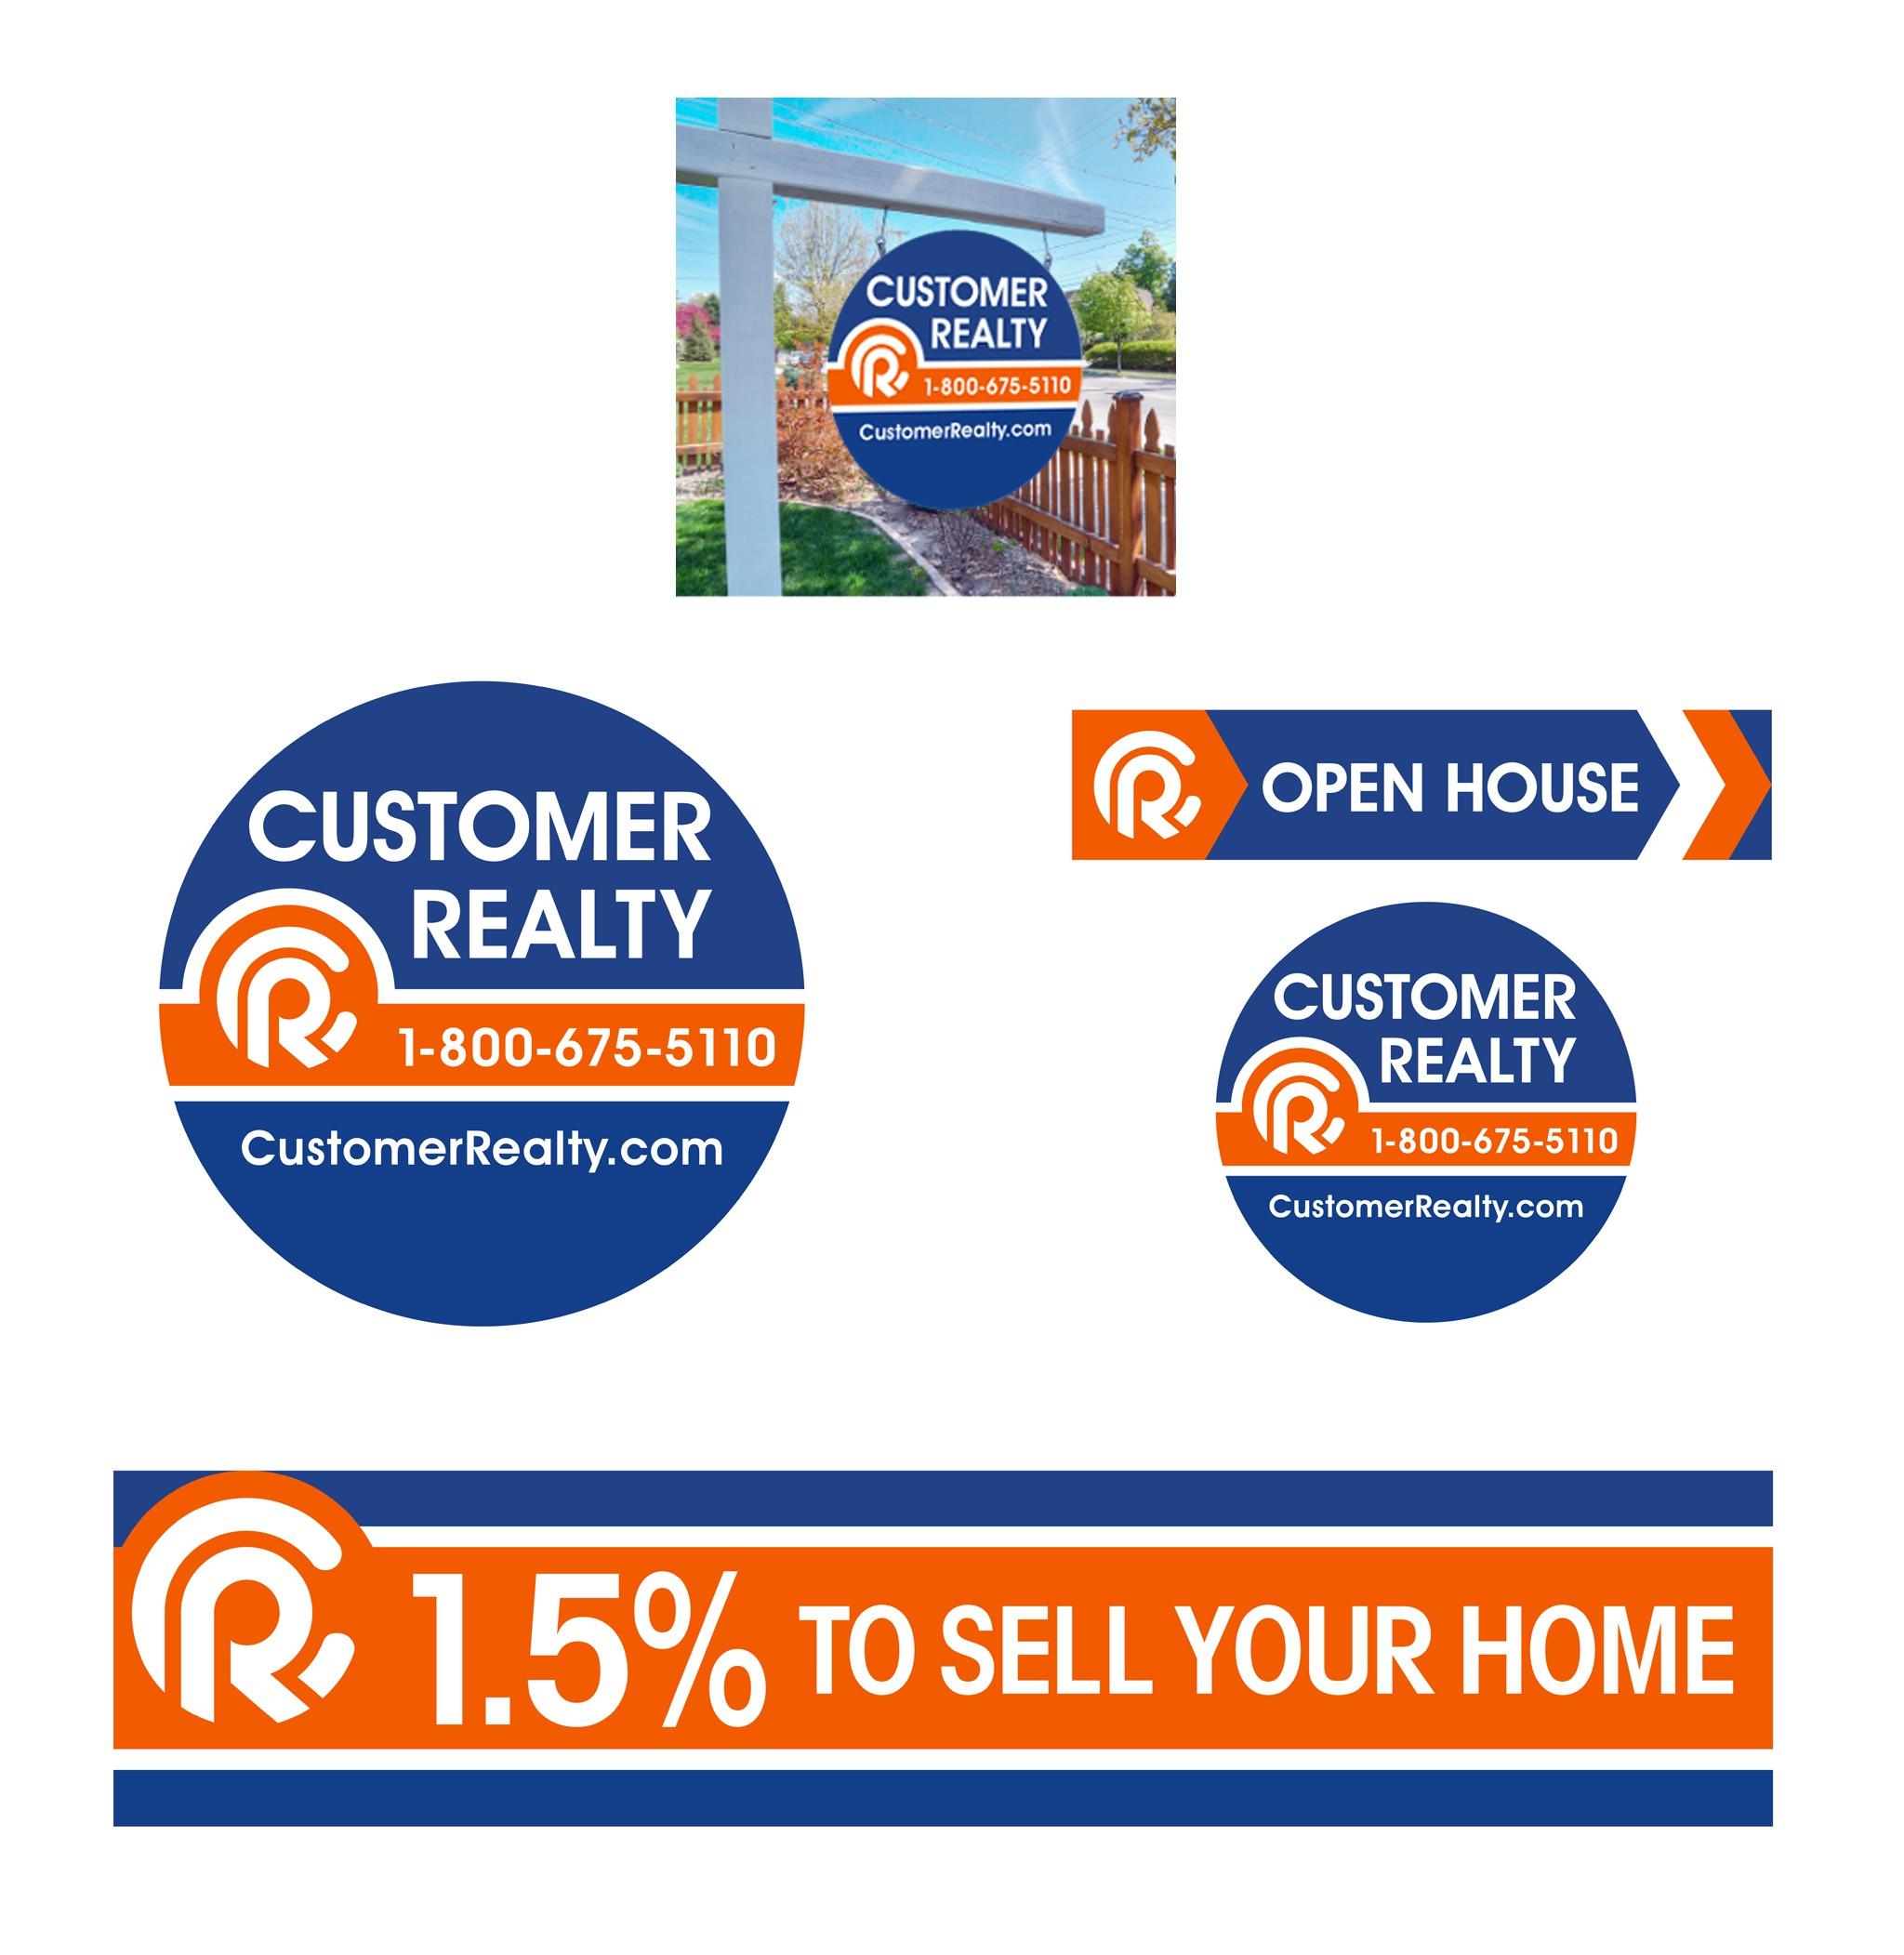 Hi!!! Please help me design a modern high-impact circular real estate sign!!